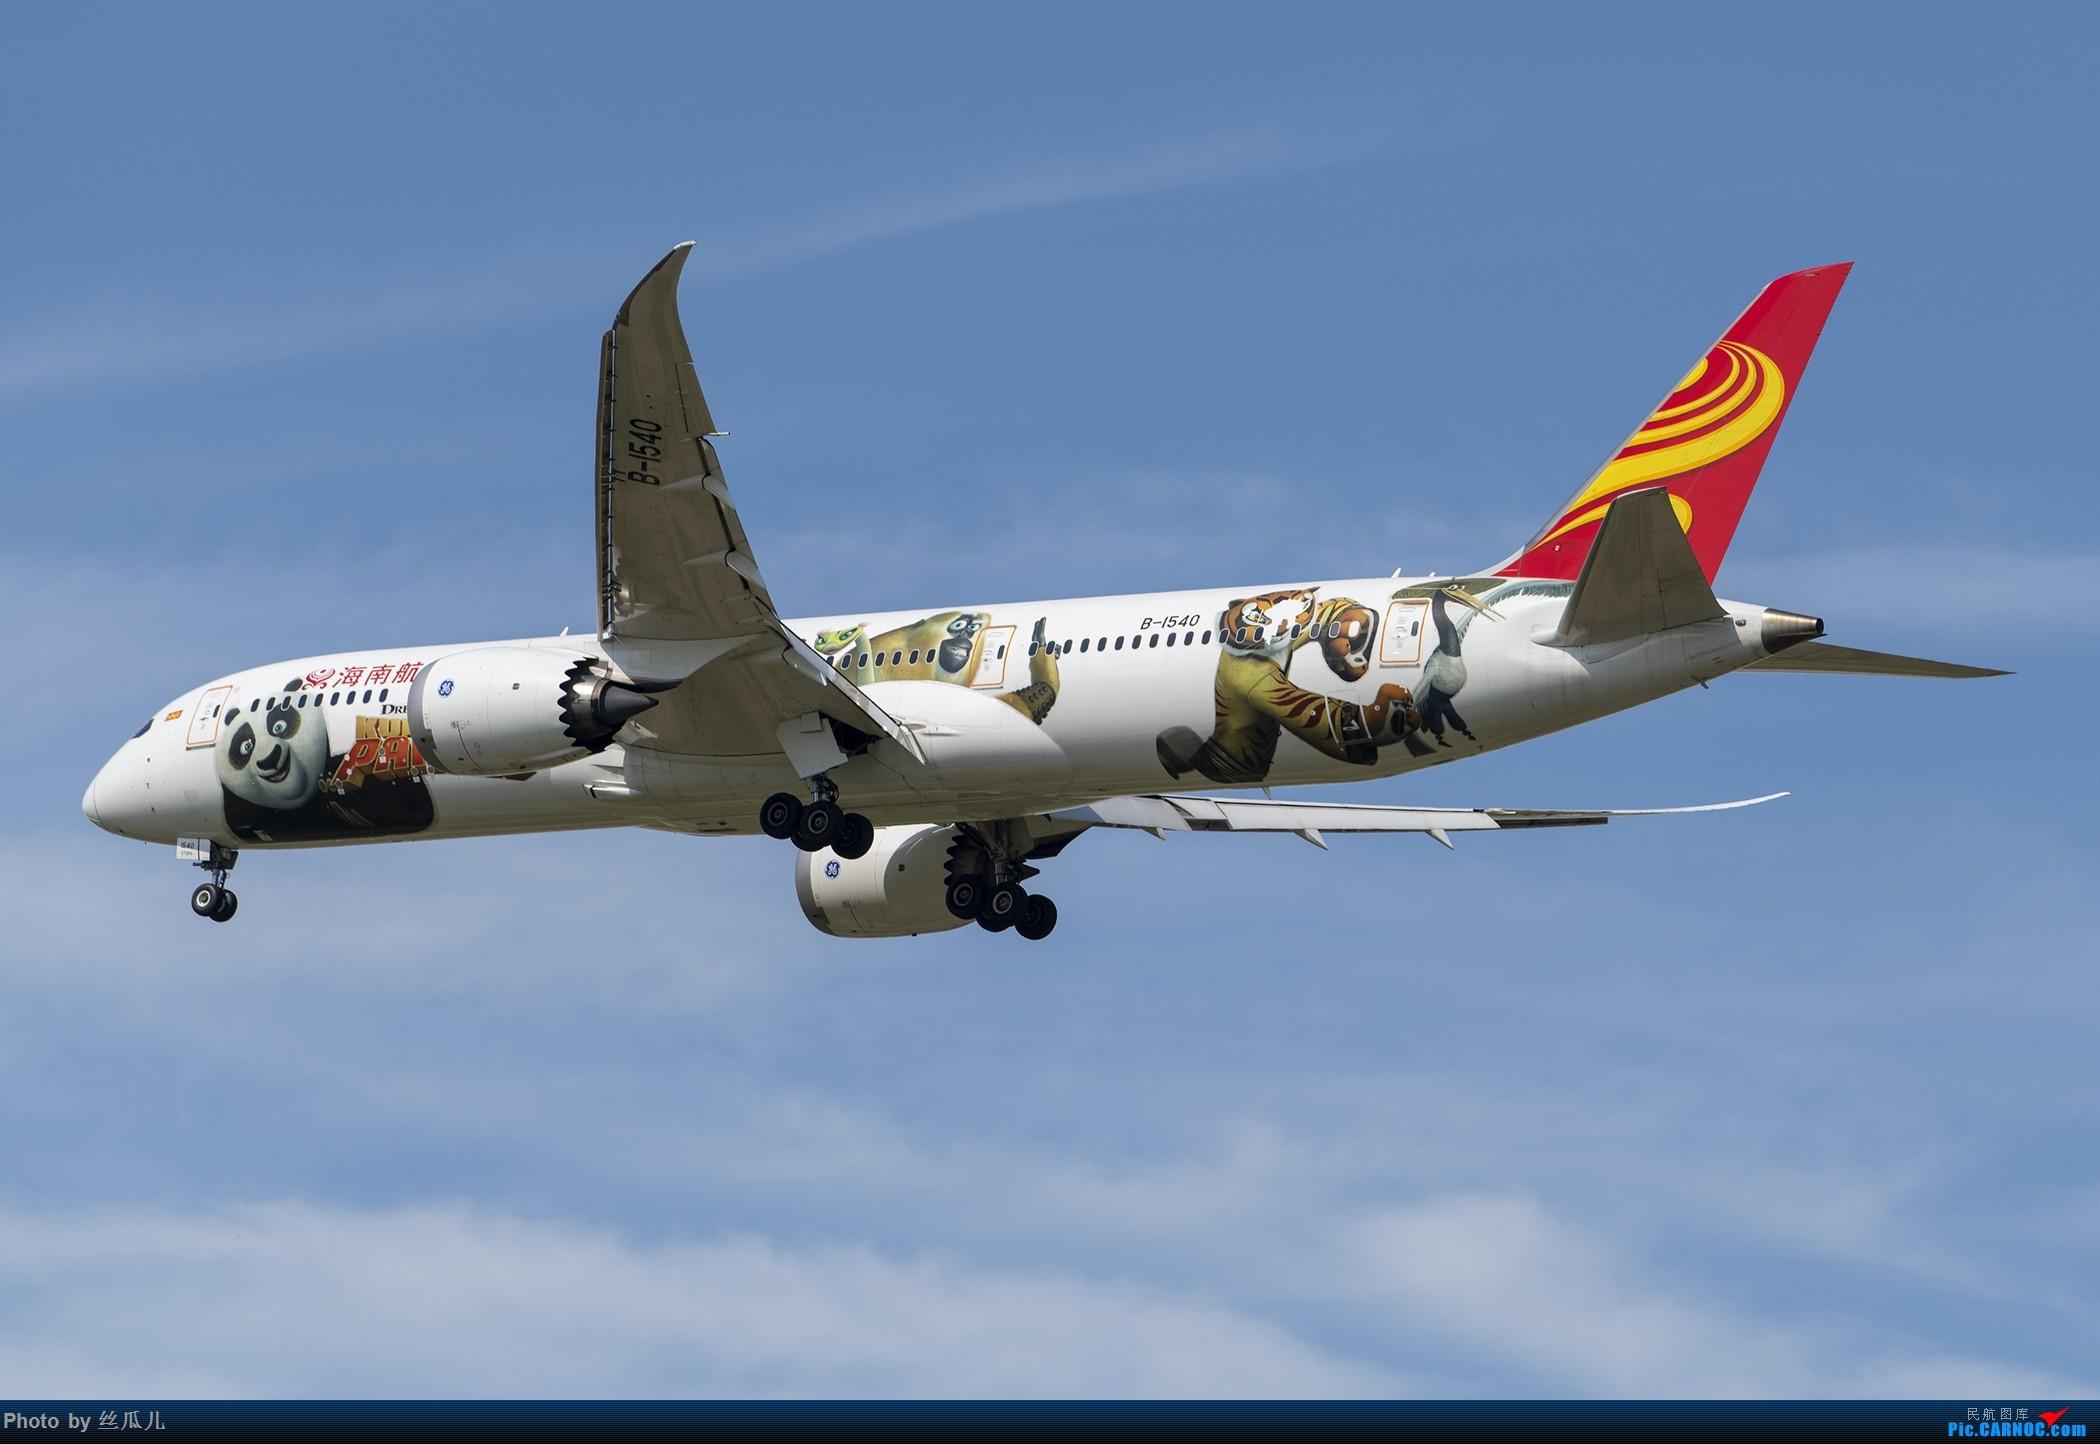 Re:[原创]【丧心病狂的丝瓜】B-1540让我再看你最后一眼----撕了一半的海航白熊猫 BOEING 787-9 B-1540 中国上海浦东国际机场